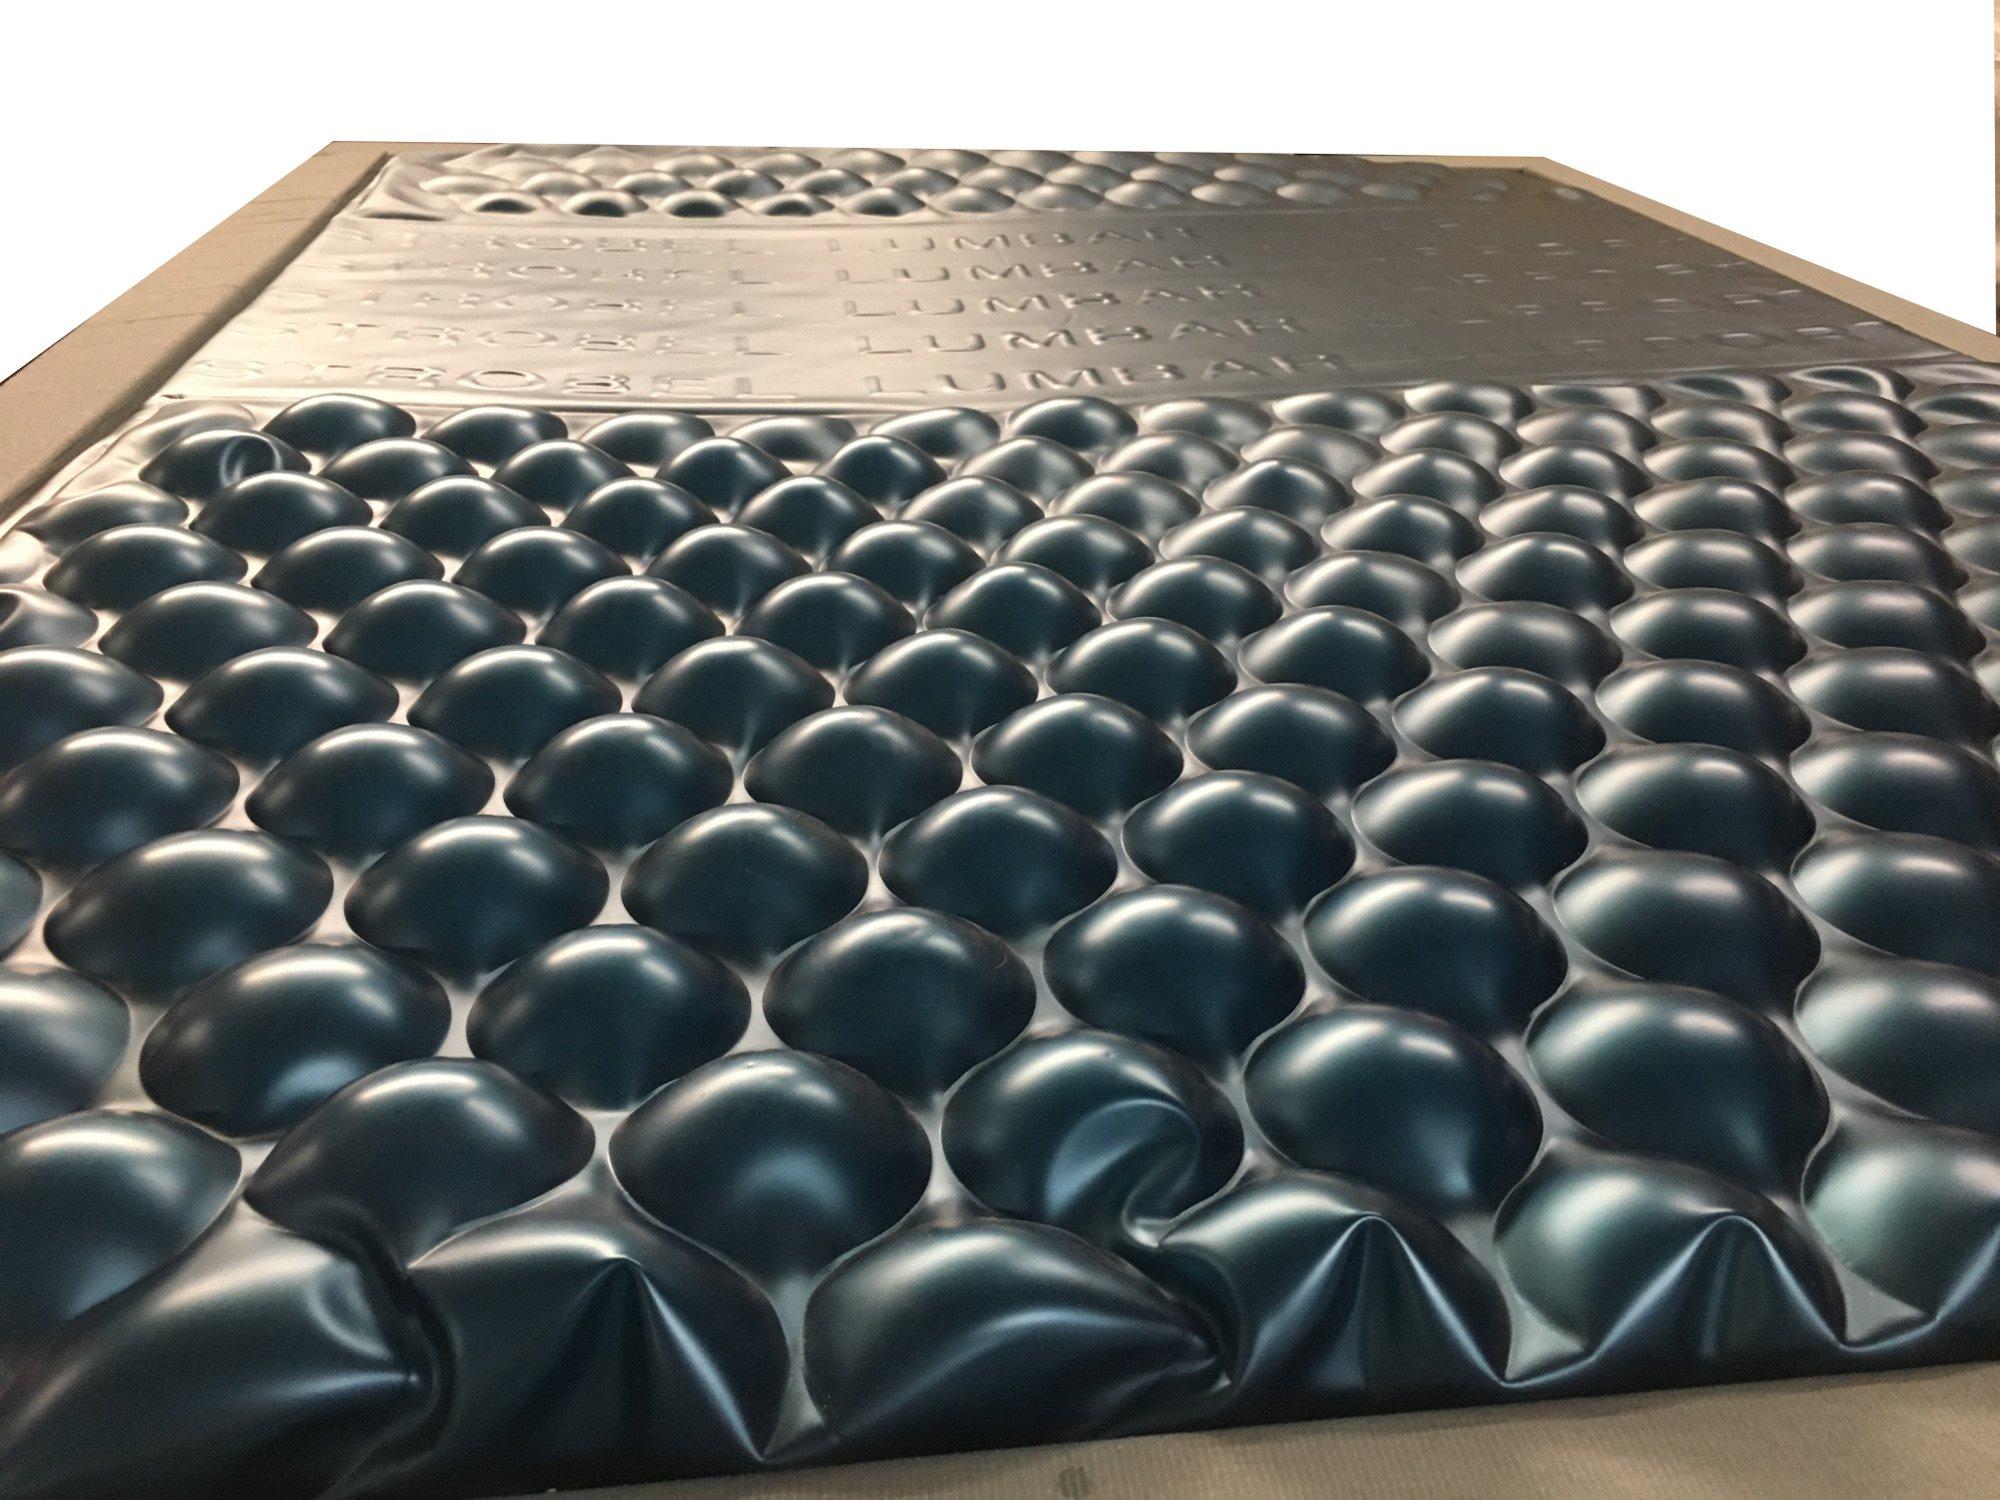 Strobel Organic Aspen Complete Waterbed 5 Board Vinyl Upholstered Black Vinyl King by Strobel Organic